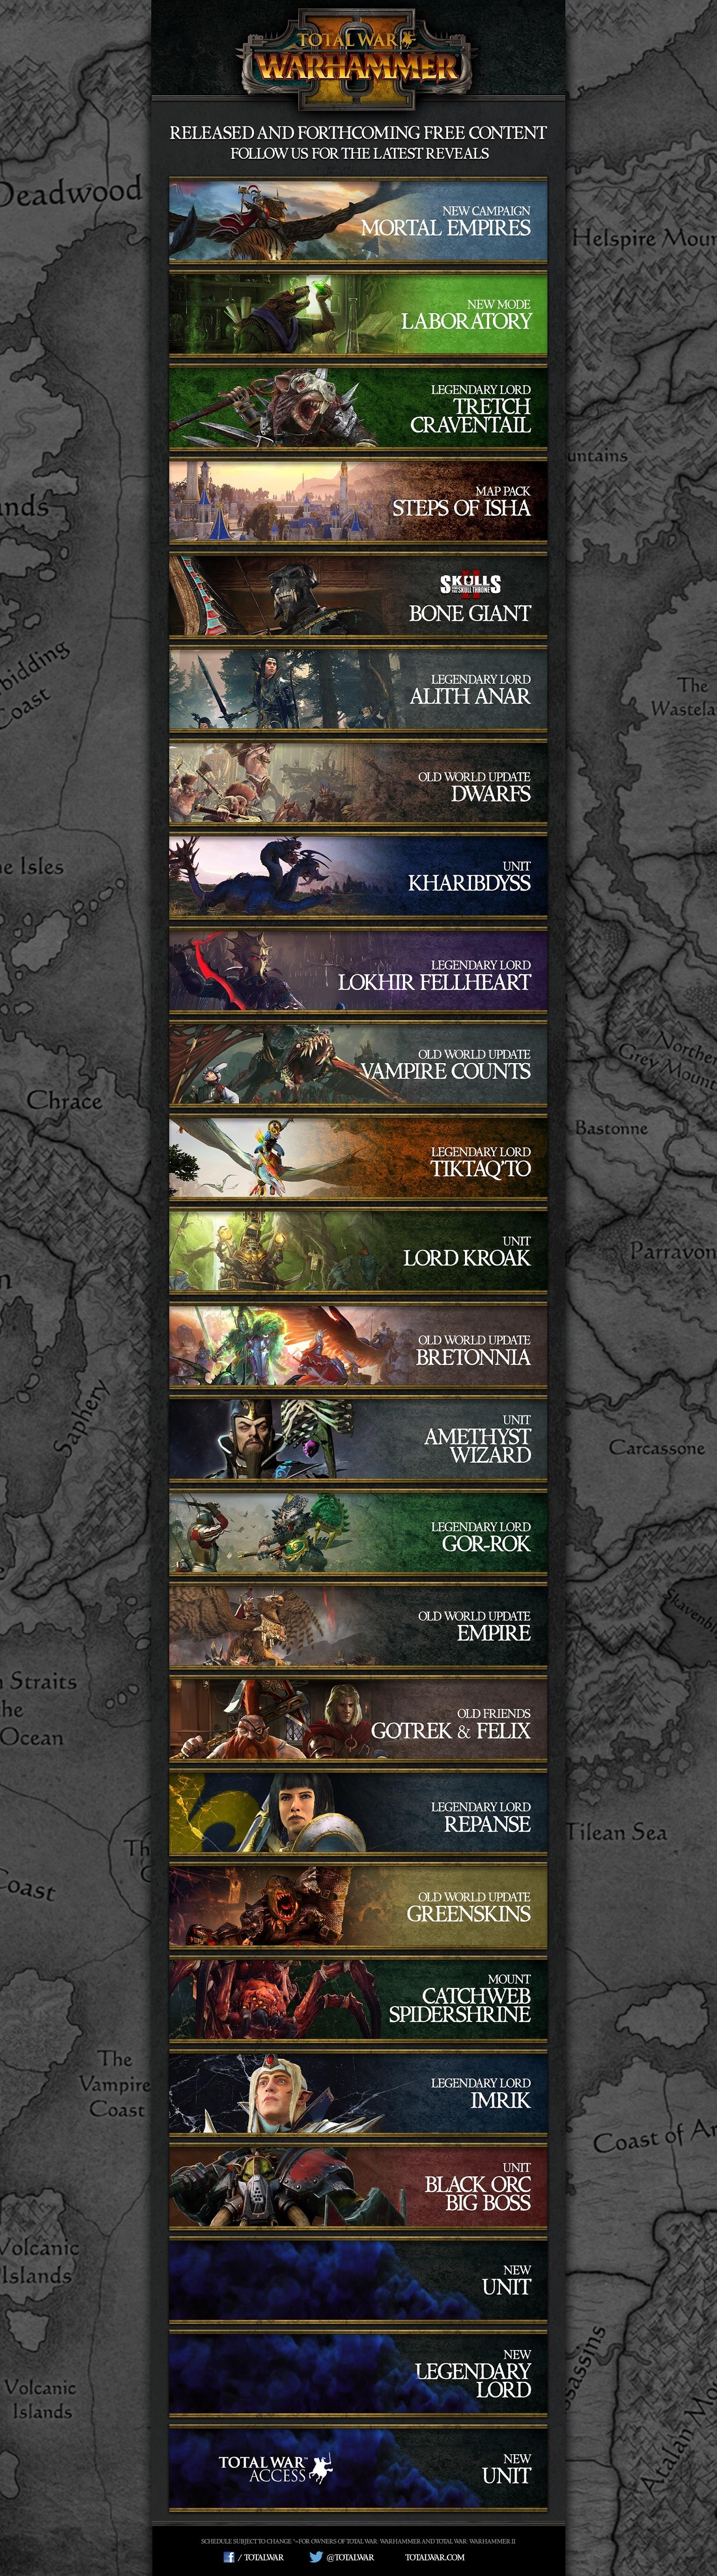 Get a sneak peek at upcoming Total War: WARHAMMER II content!